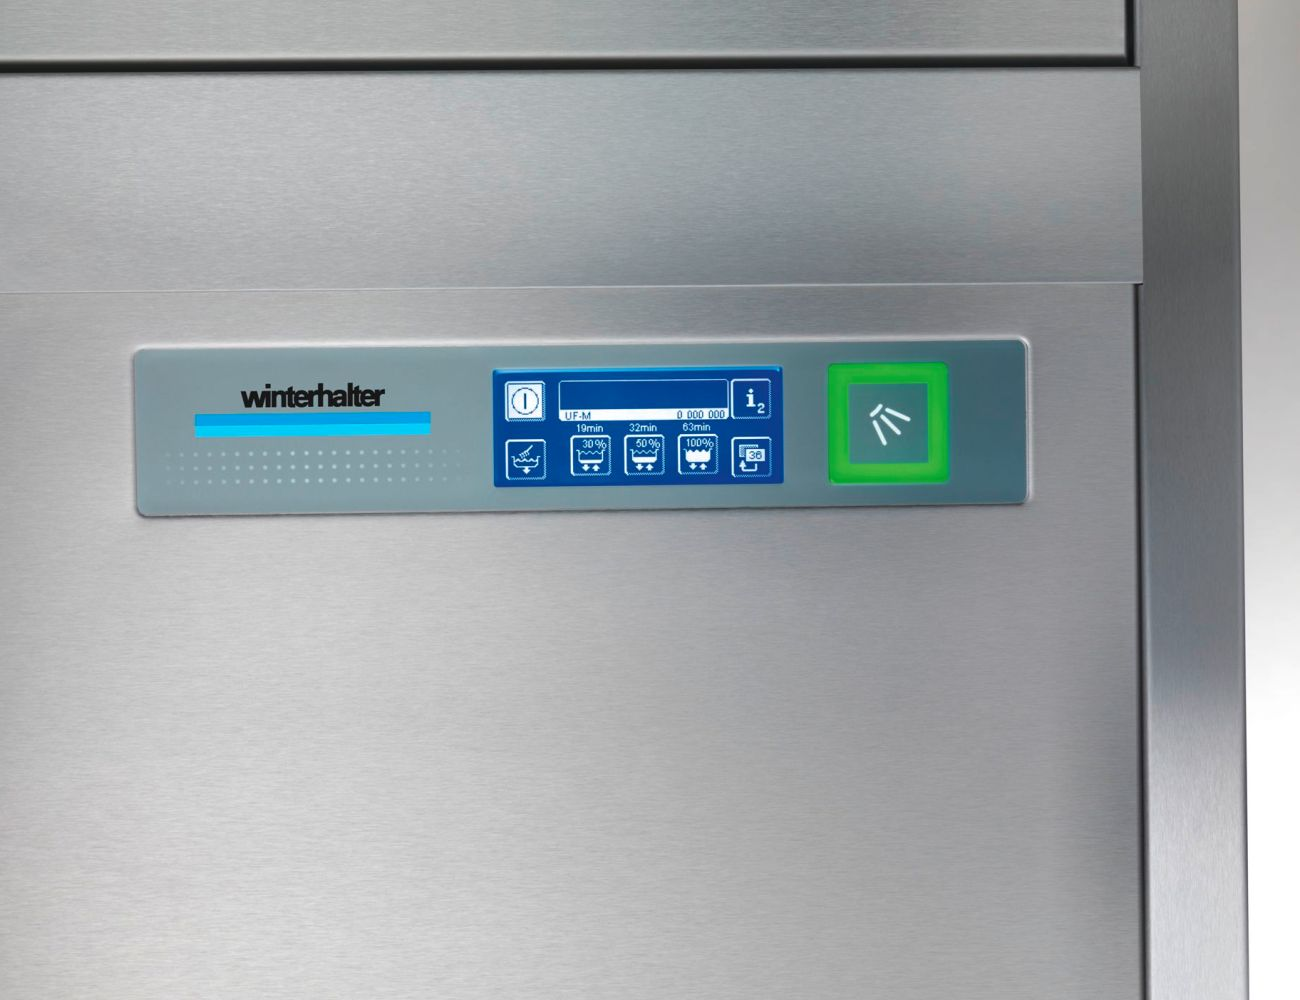 distributer-winterhalter-crna-gora-2